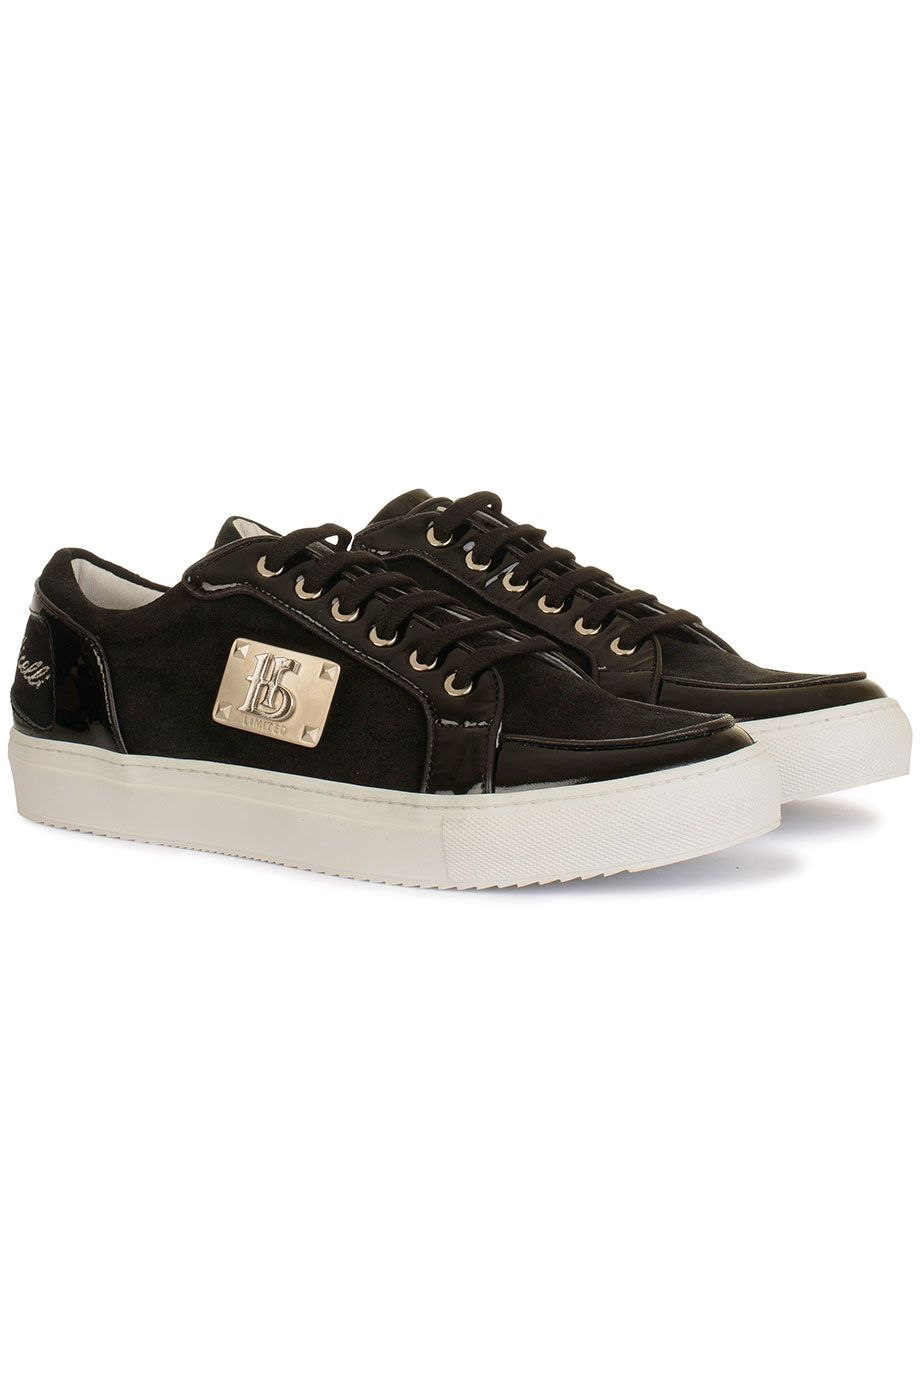 size 40 ddbb4 d7b13 Hippe Botticelli limited limited 26771 nero (zwart) Heren sneakers van het  merk botticelli limited